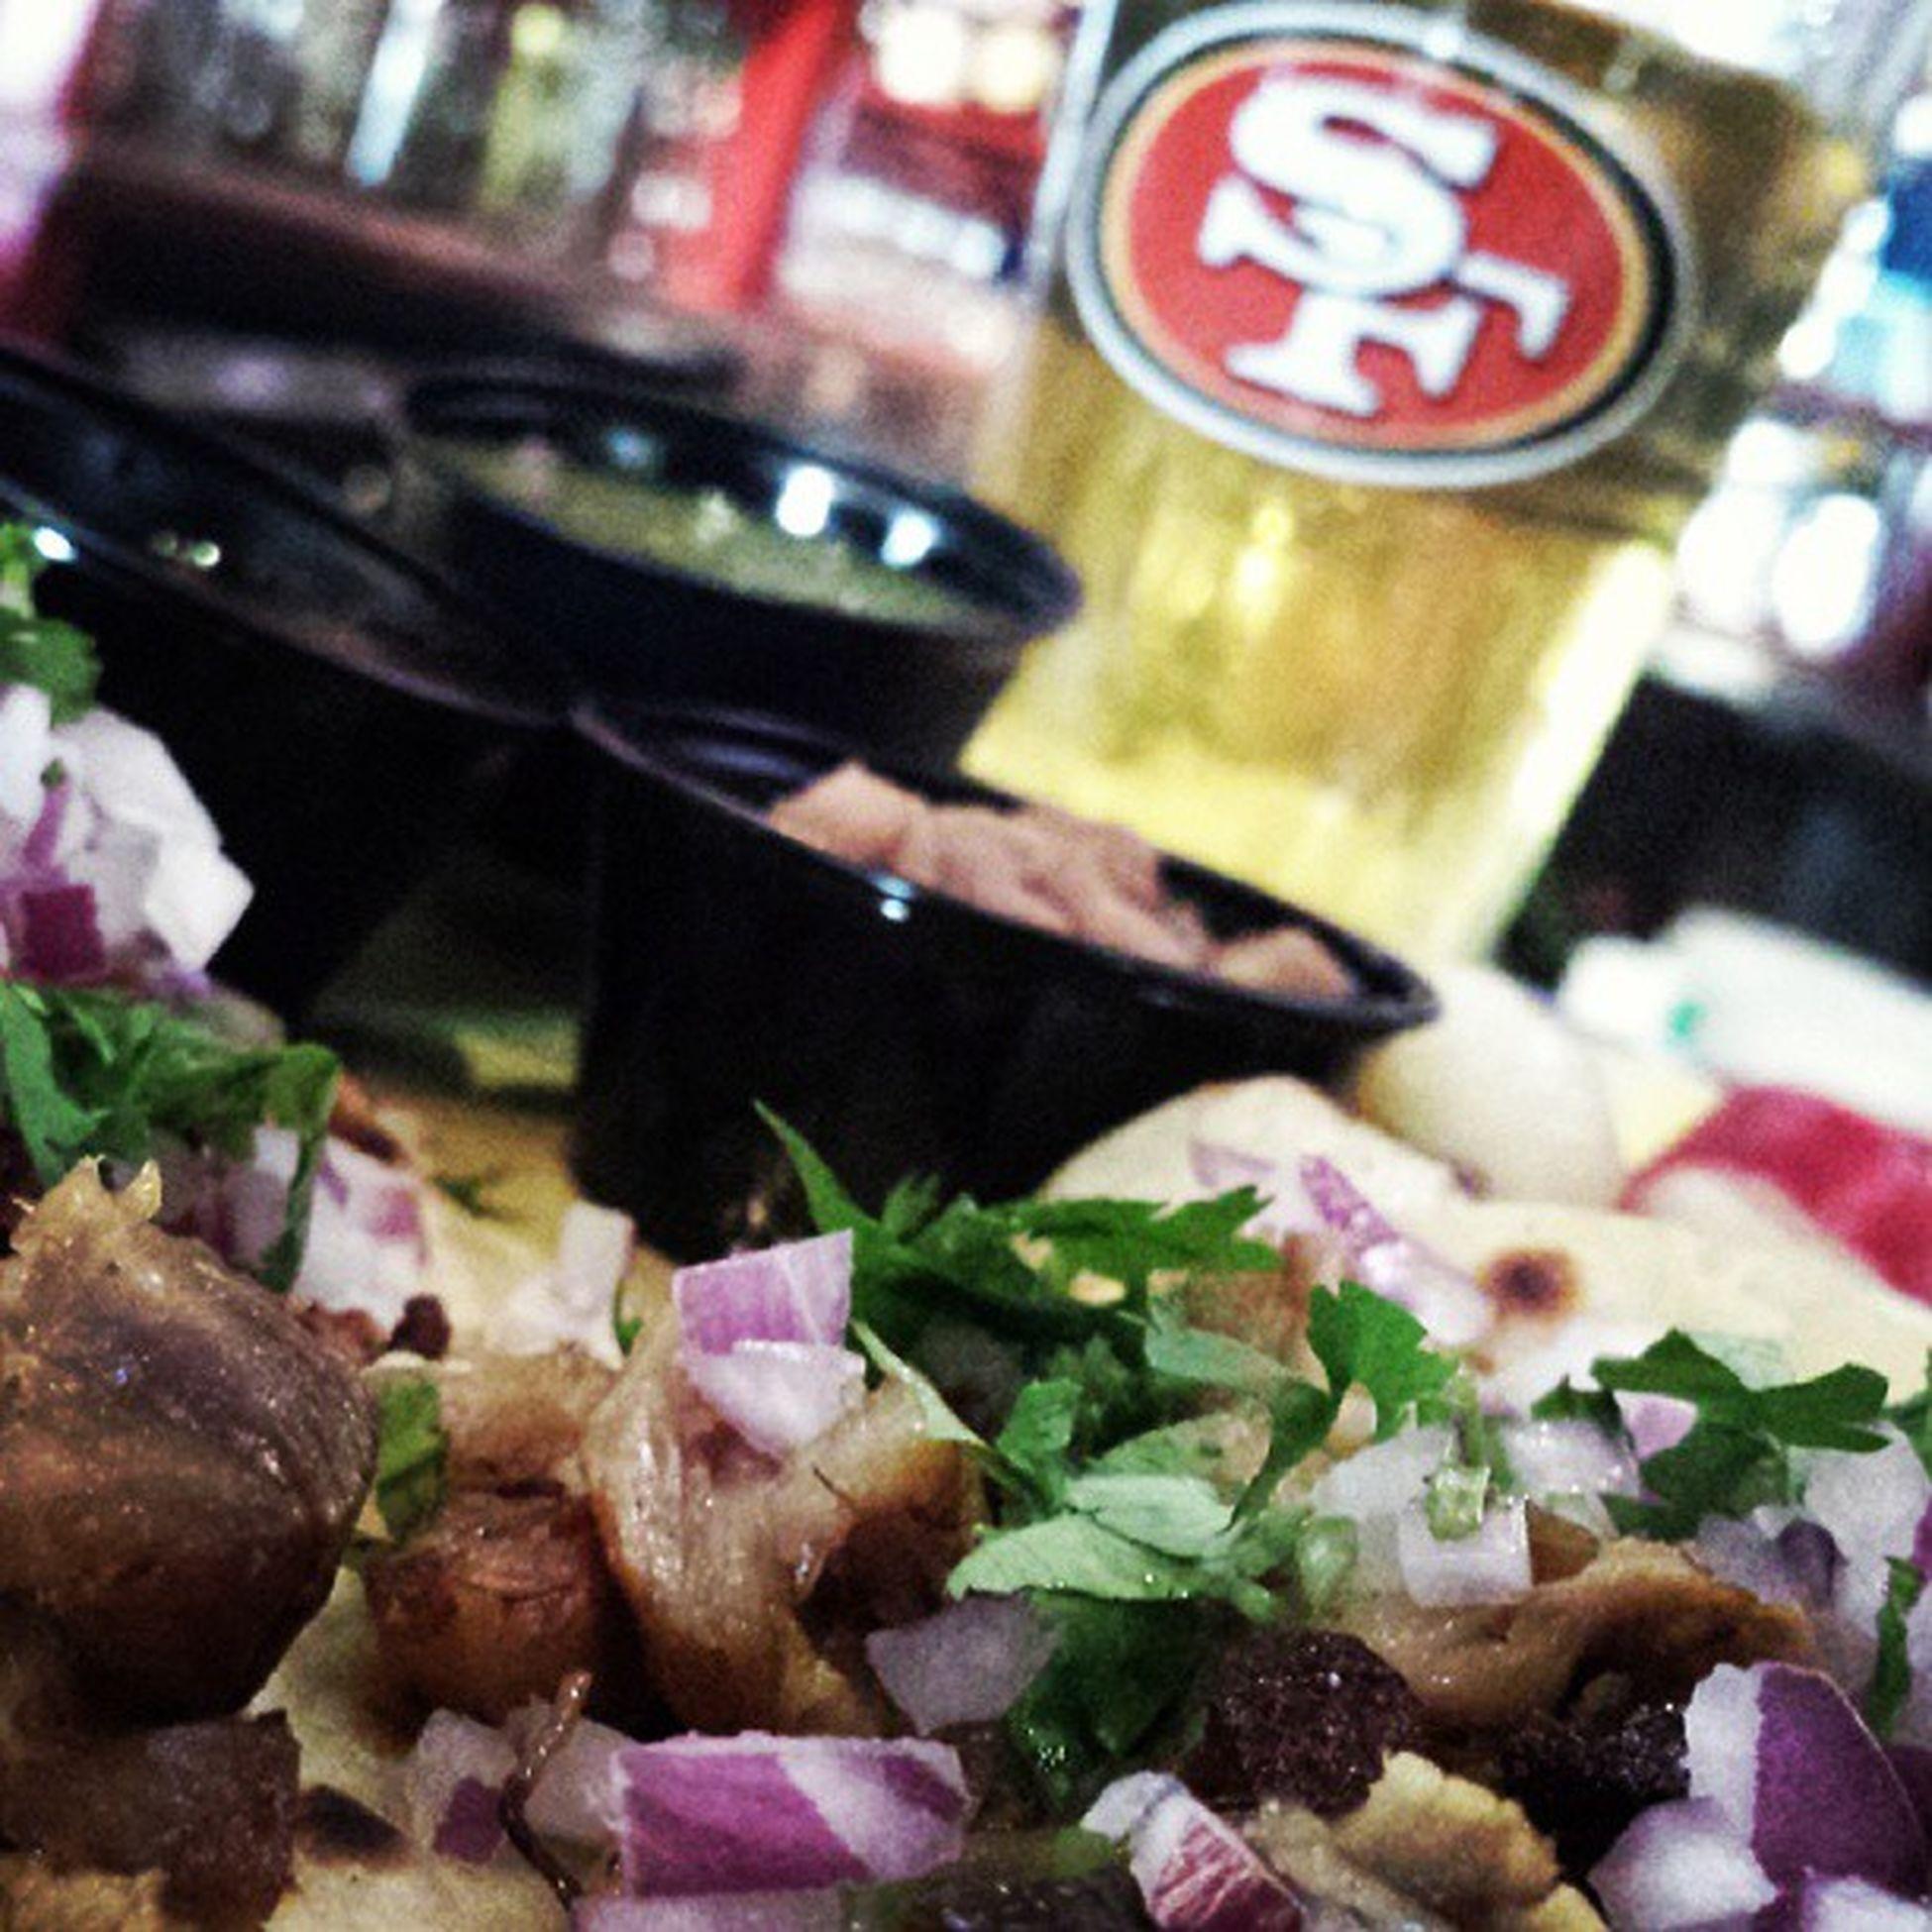 Best tacos in Bay Area LaPz Dsj Iliveablockaway Tacosallday 408